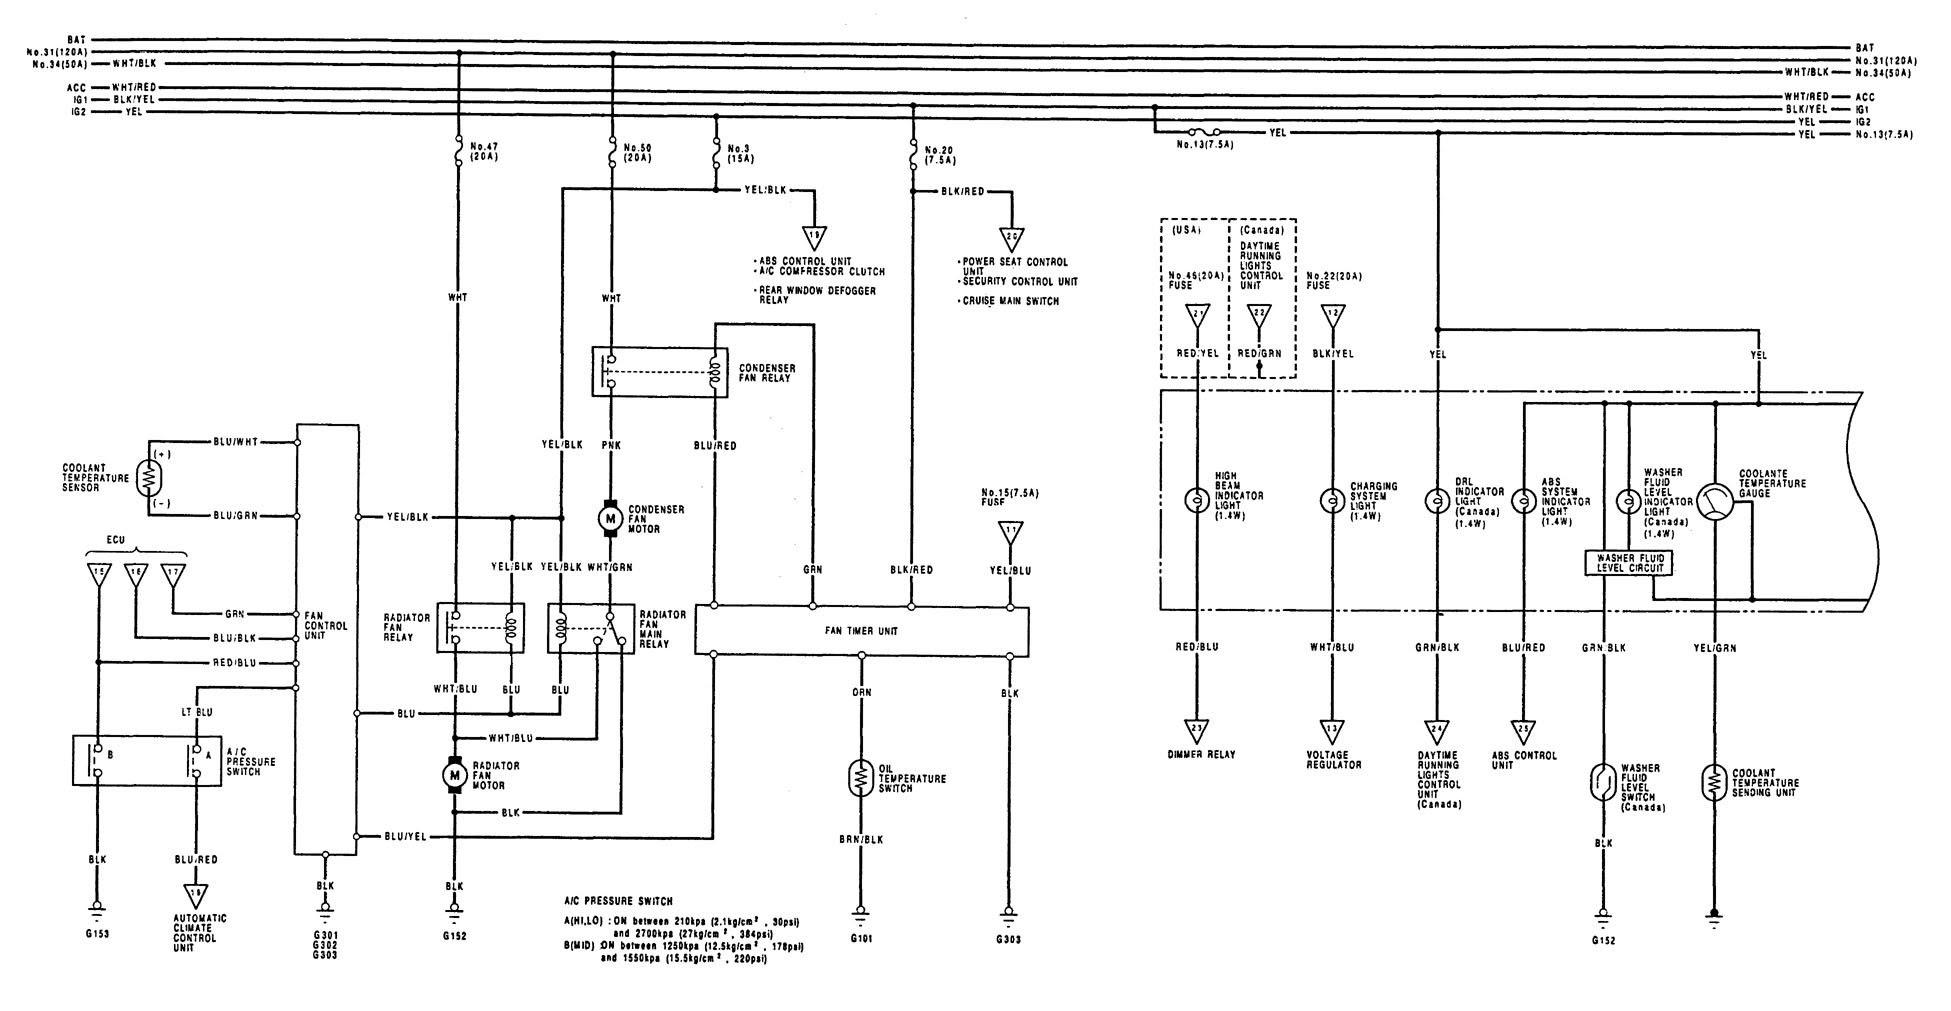 1995 Acura Integra Wiring Diagram - Wiring Diagram Schema